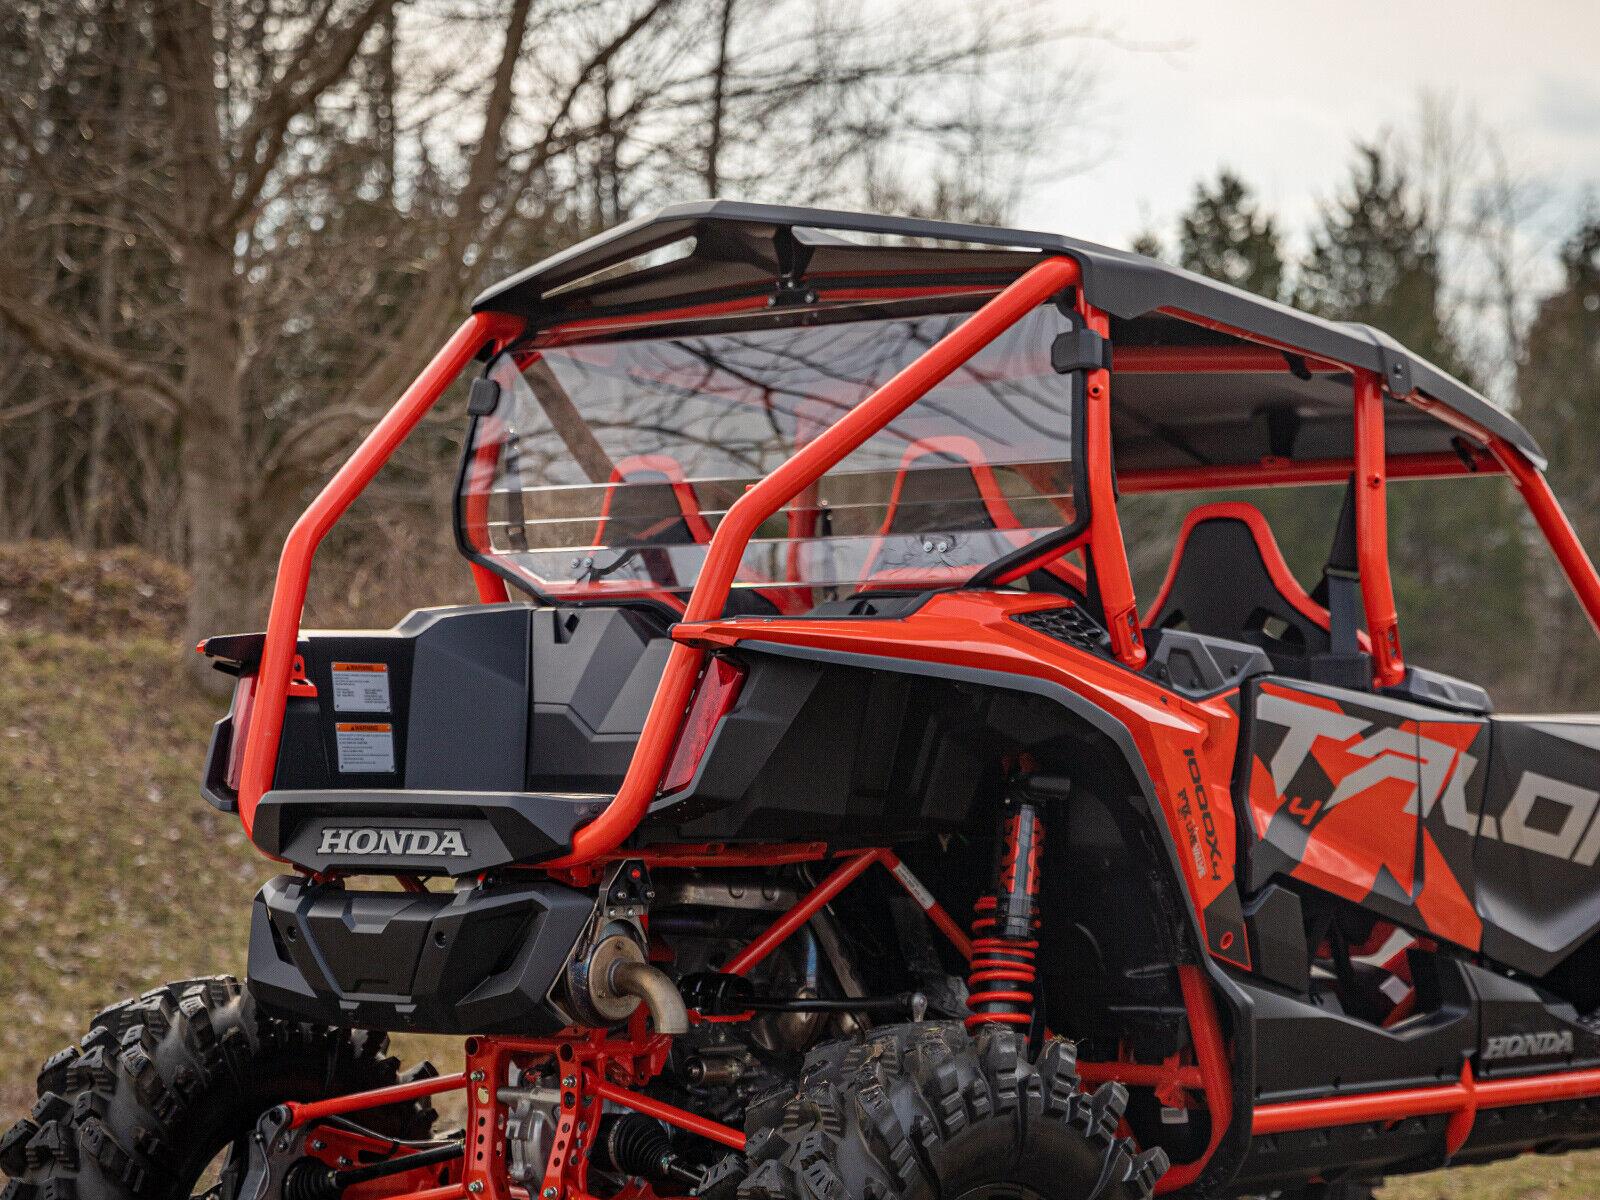 SuperATV Heavy Duty Rhino Brand CV Axle for Honda Talon 1000X // 1000X-4 12 Month Warranty 2019+ - FRONT